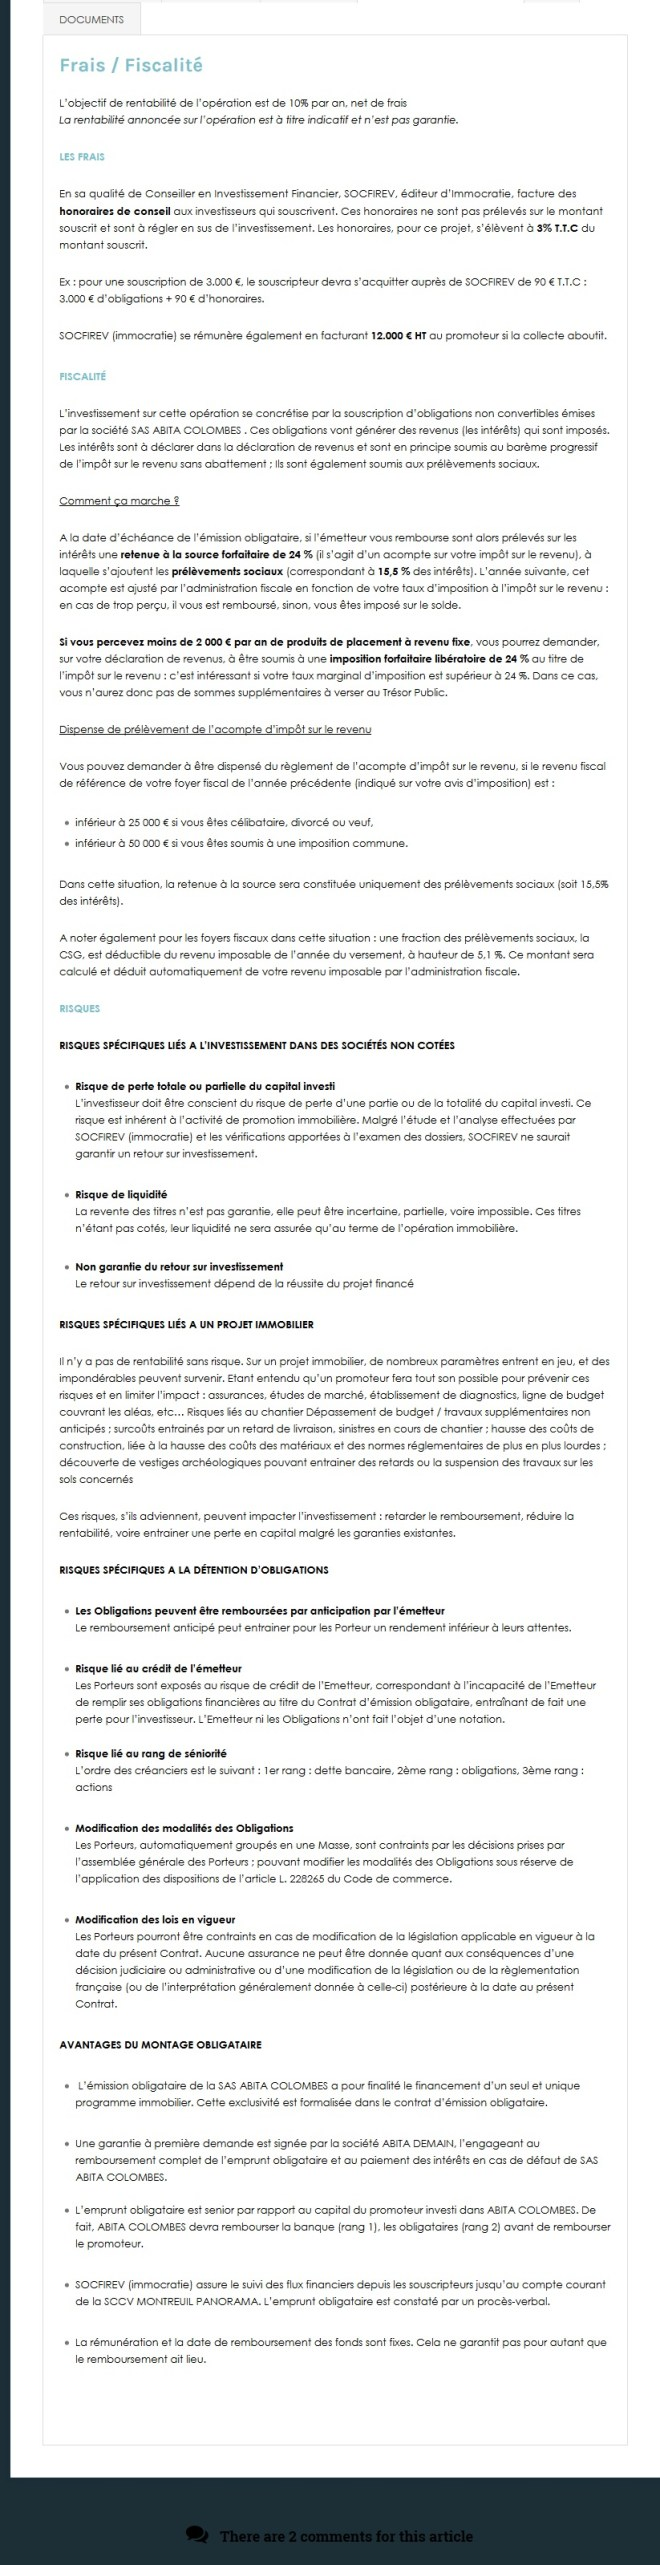 immocratie-crowdfunding-crowdlending-immobilier-projet-07